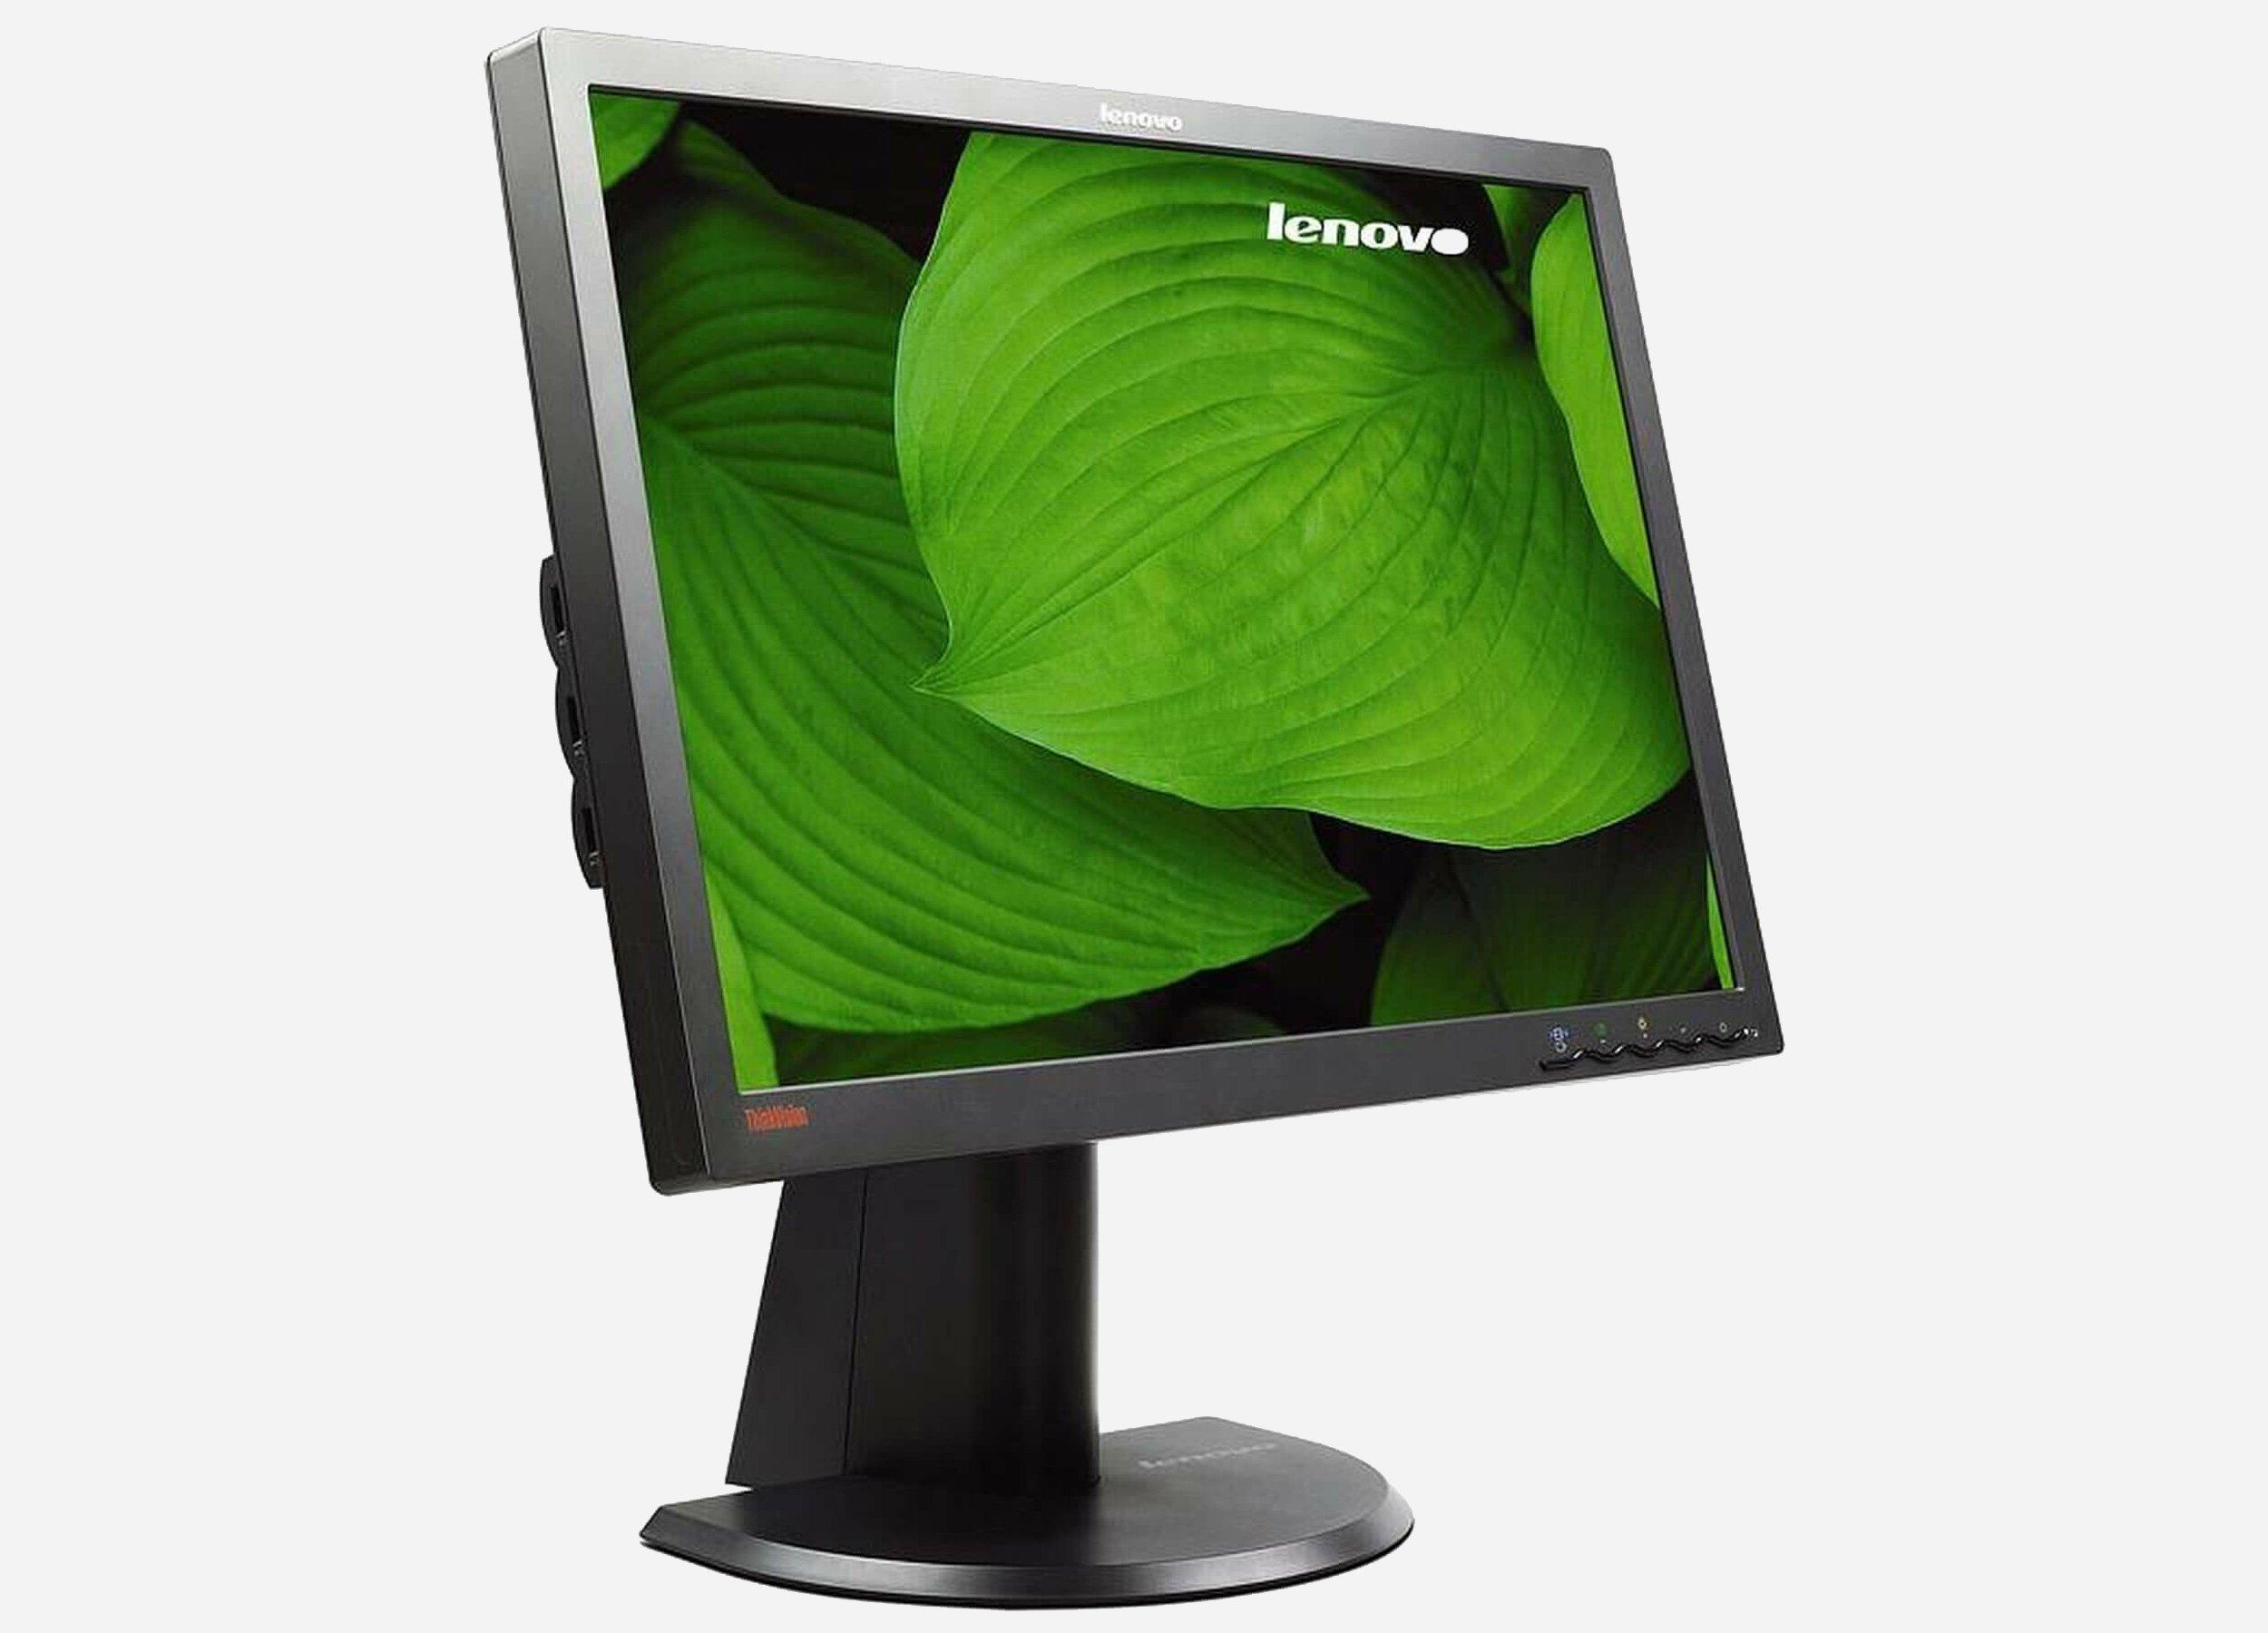 Lenovo thinkvision t2452pw